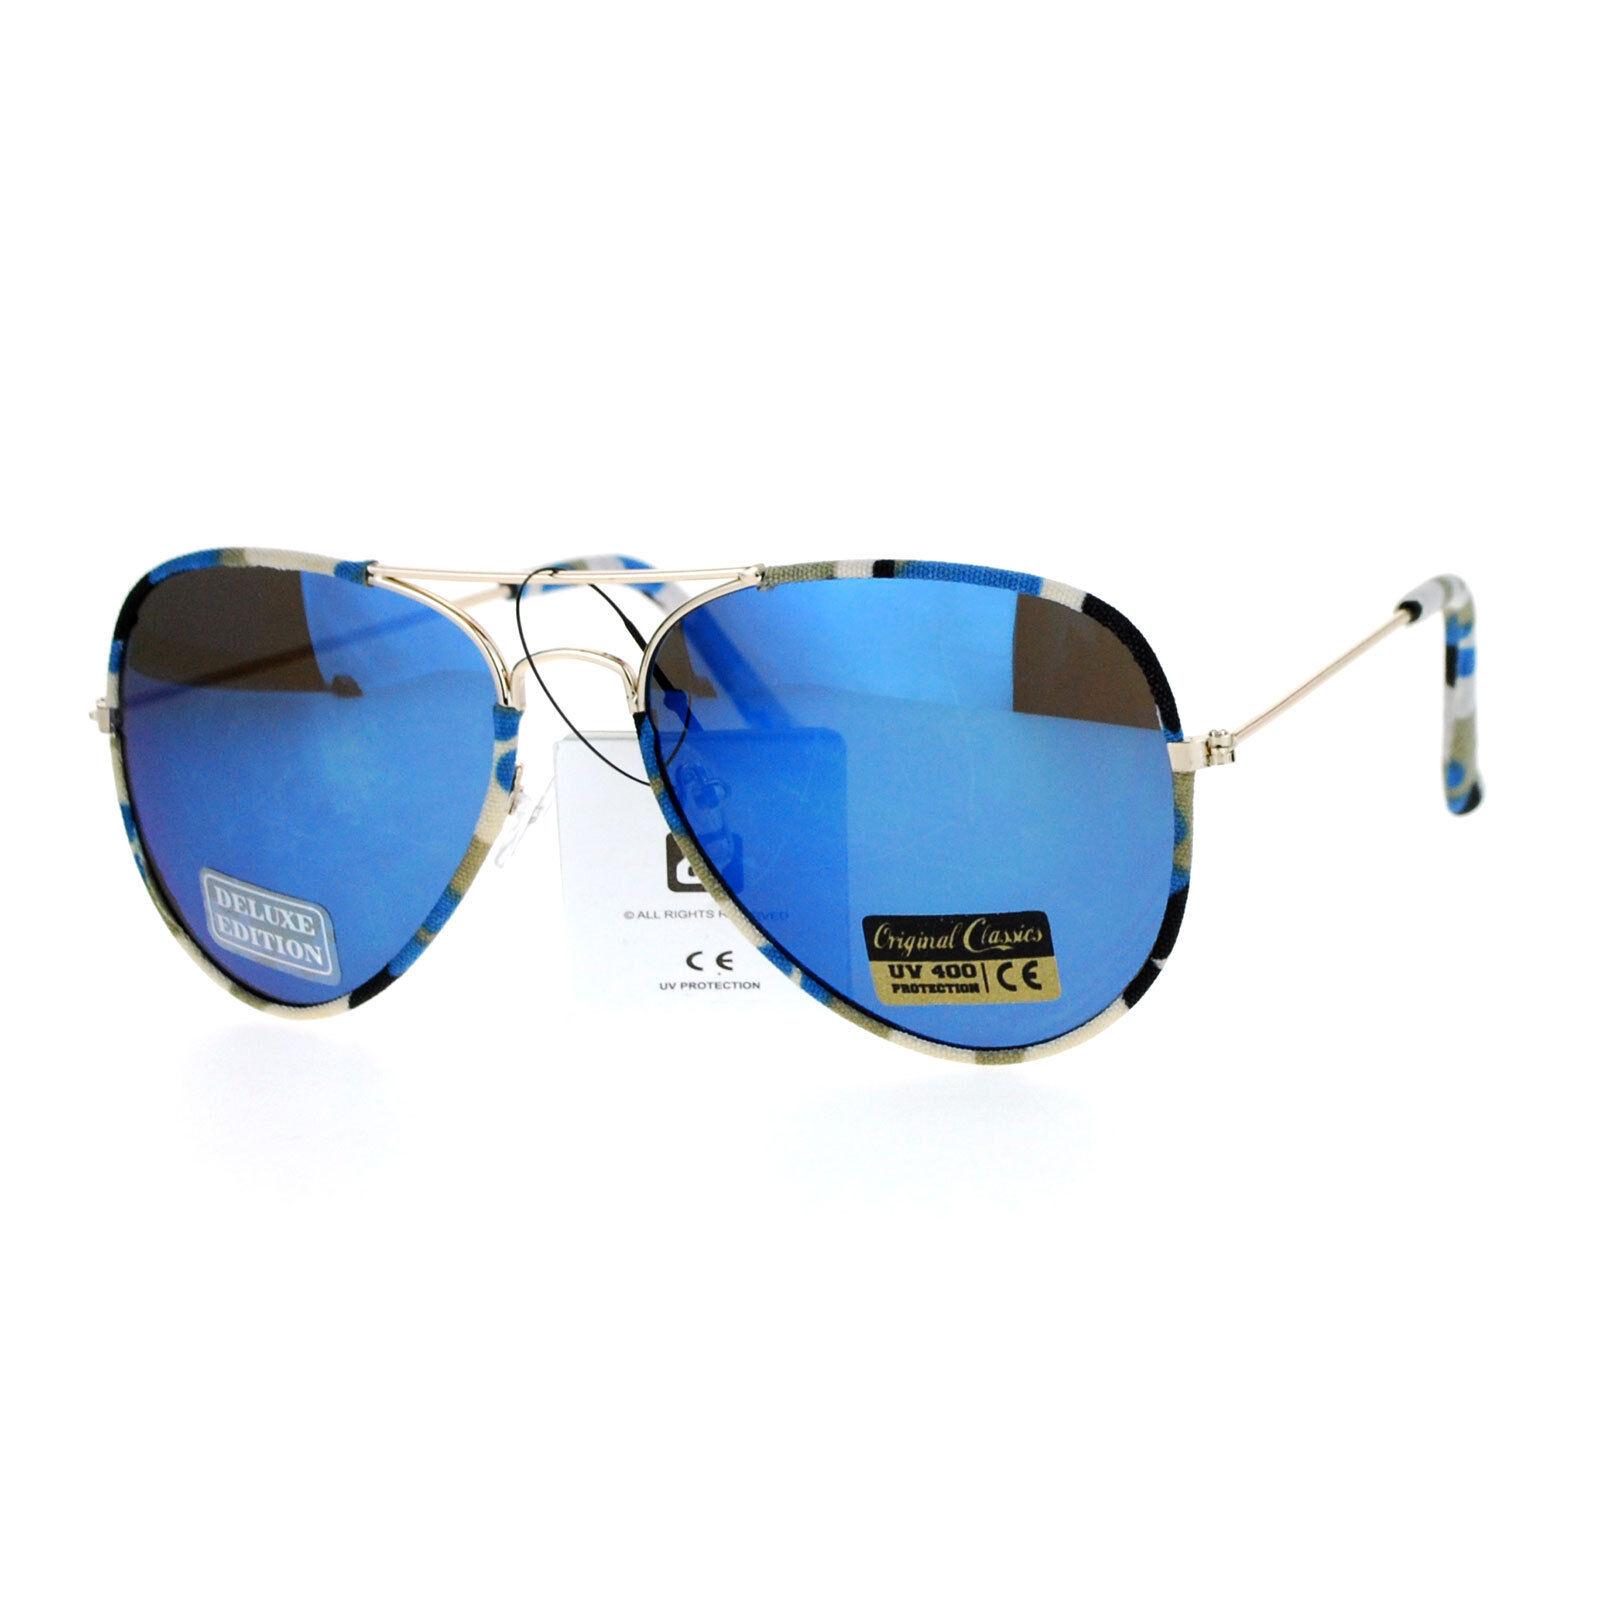 Camo Camouflage Print Fabric Frame Aviator Sunglasses Unisex